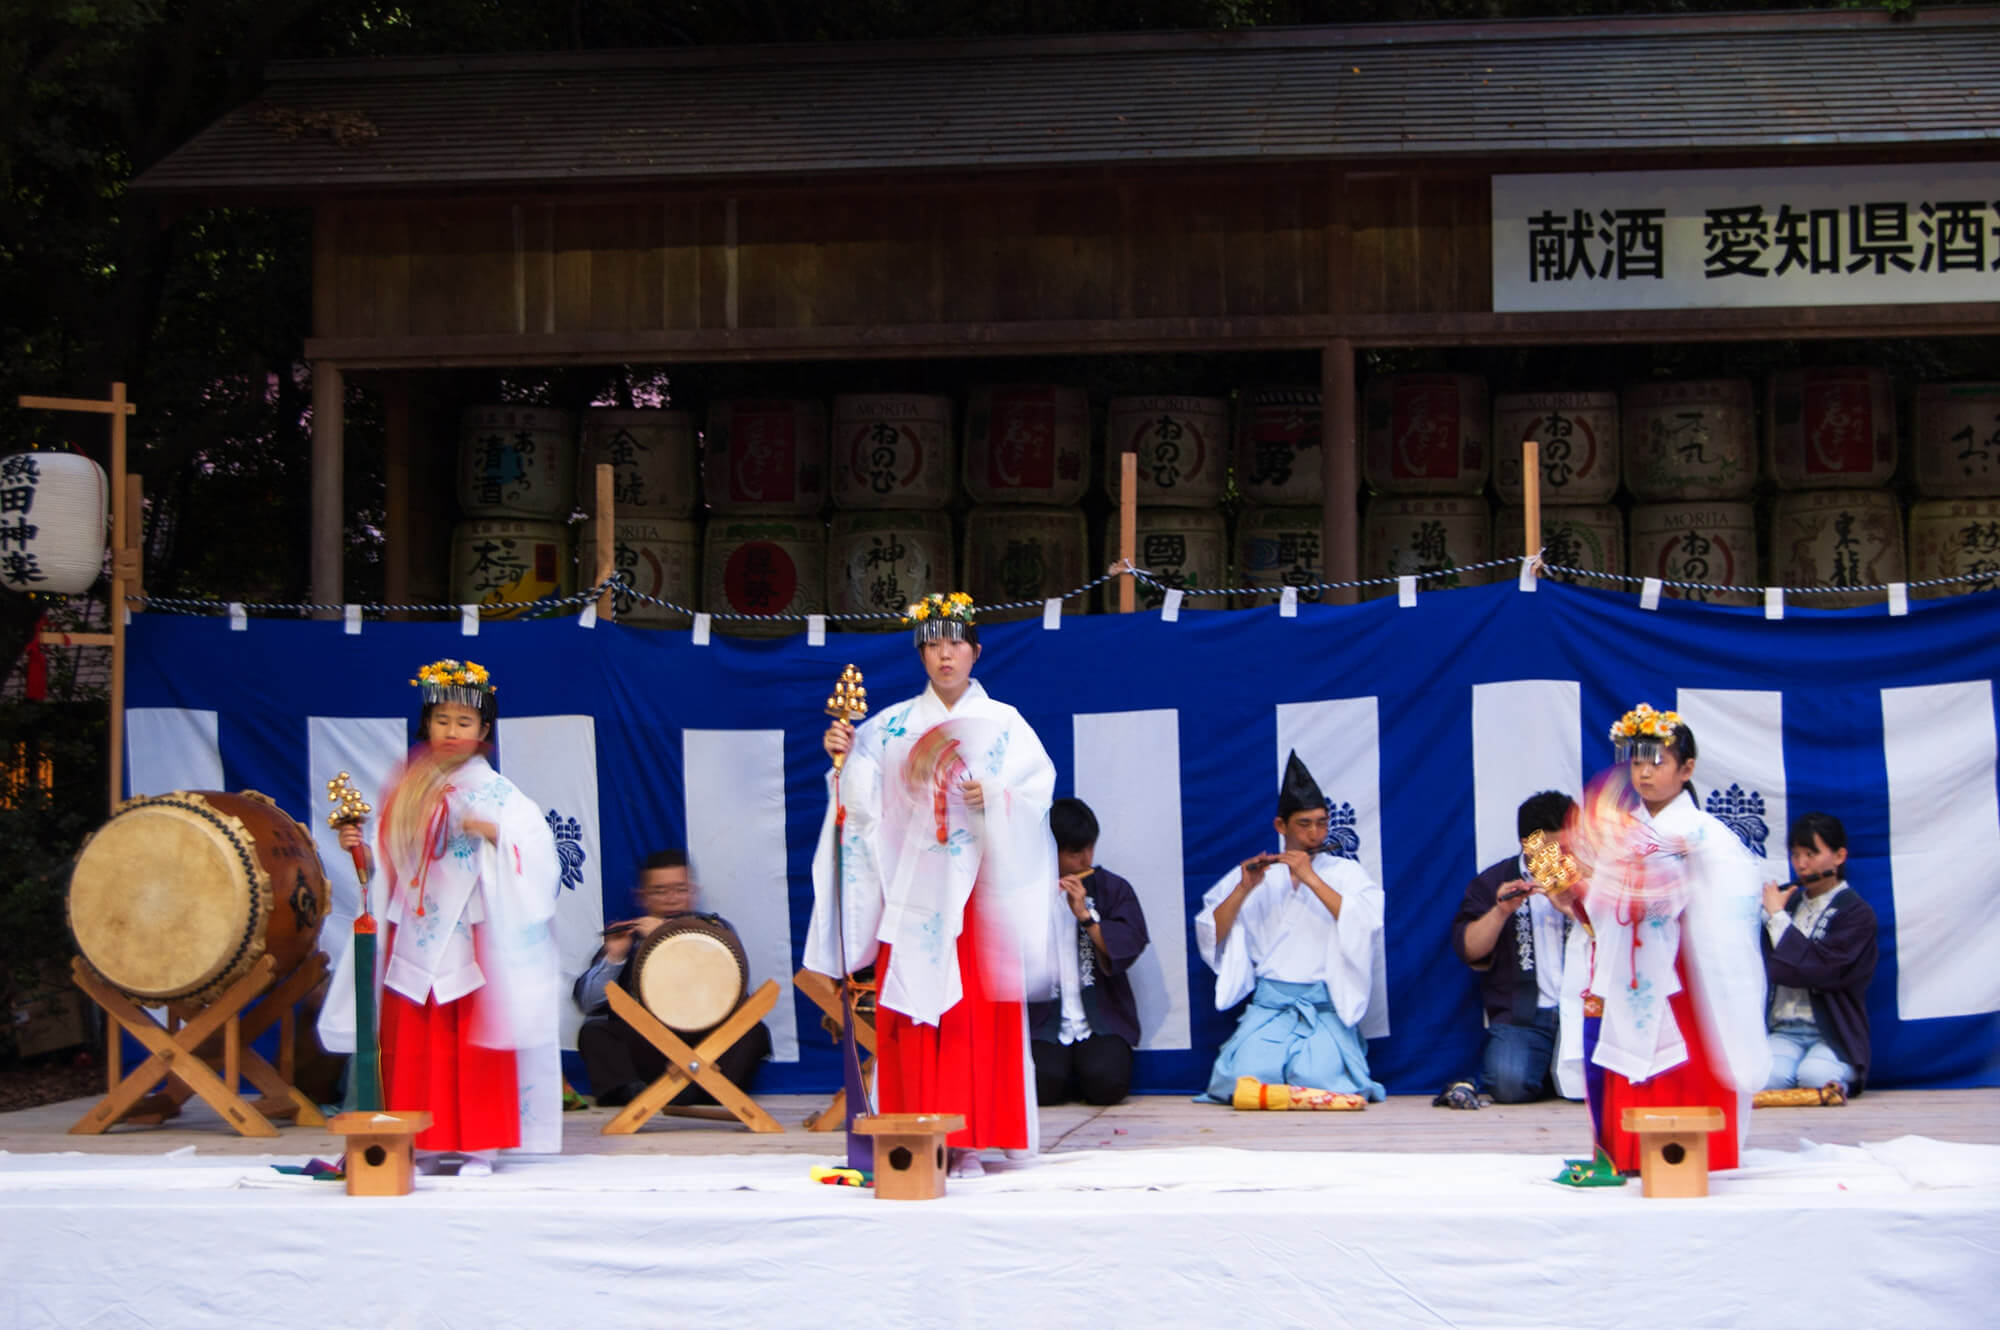 Atsuta Festival